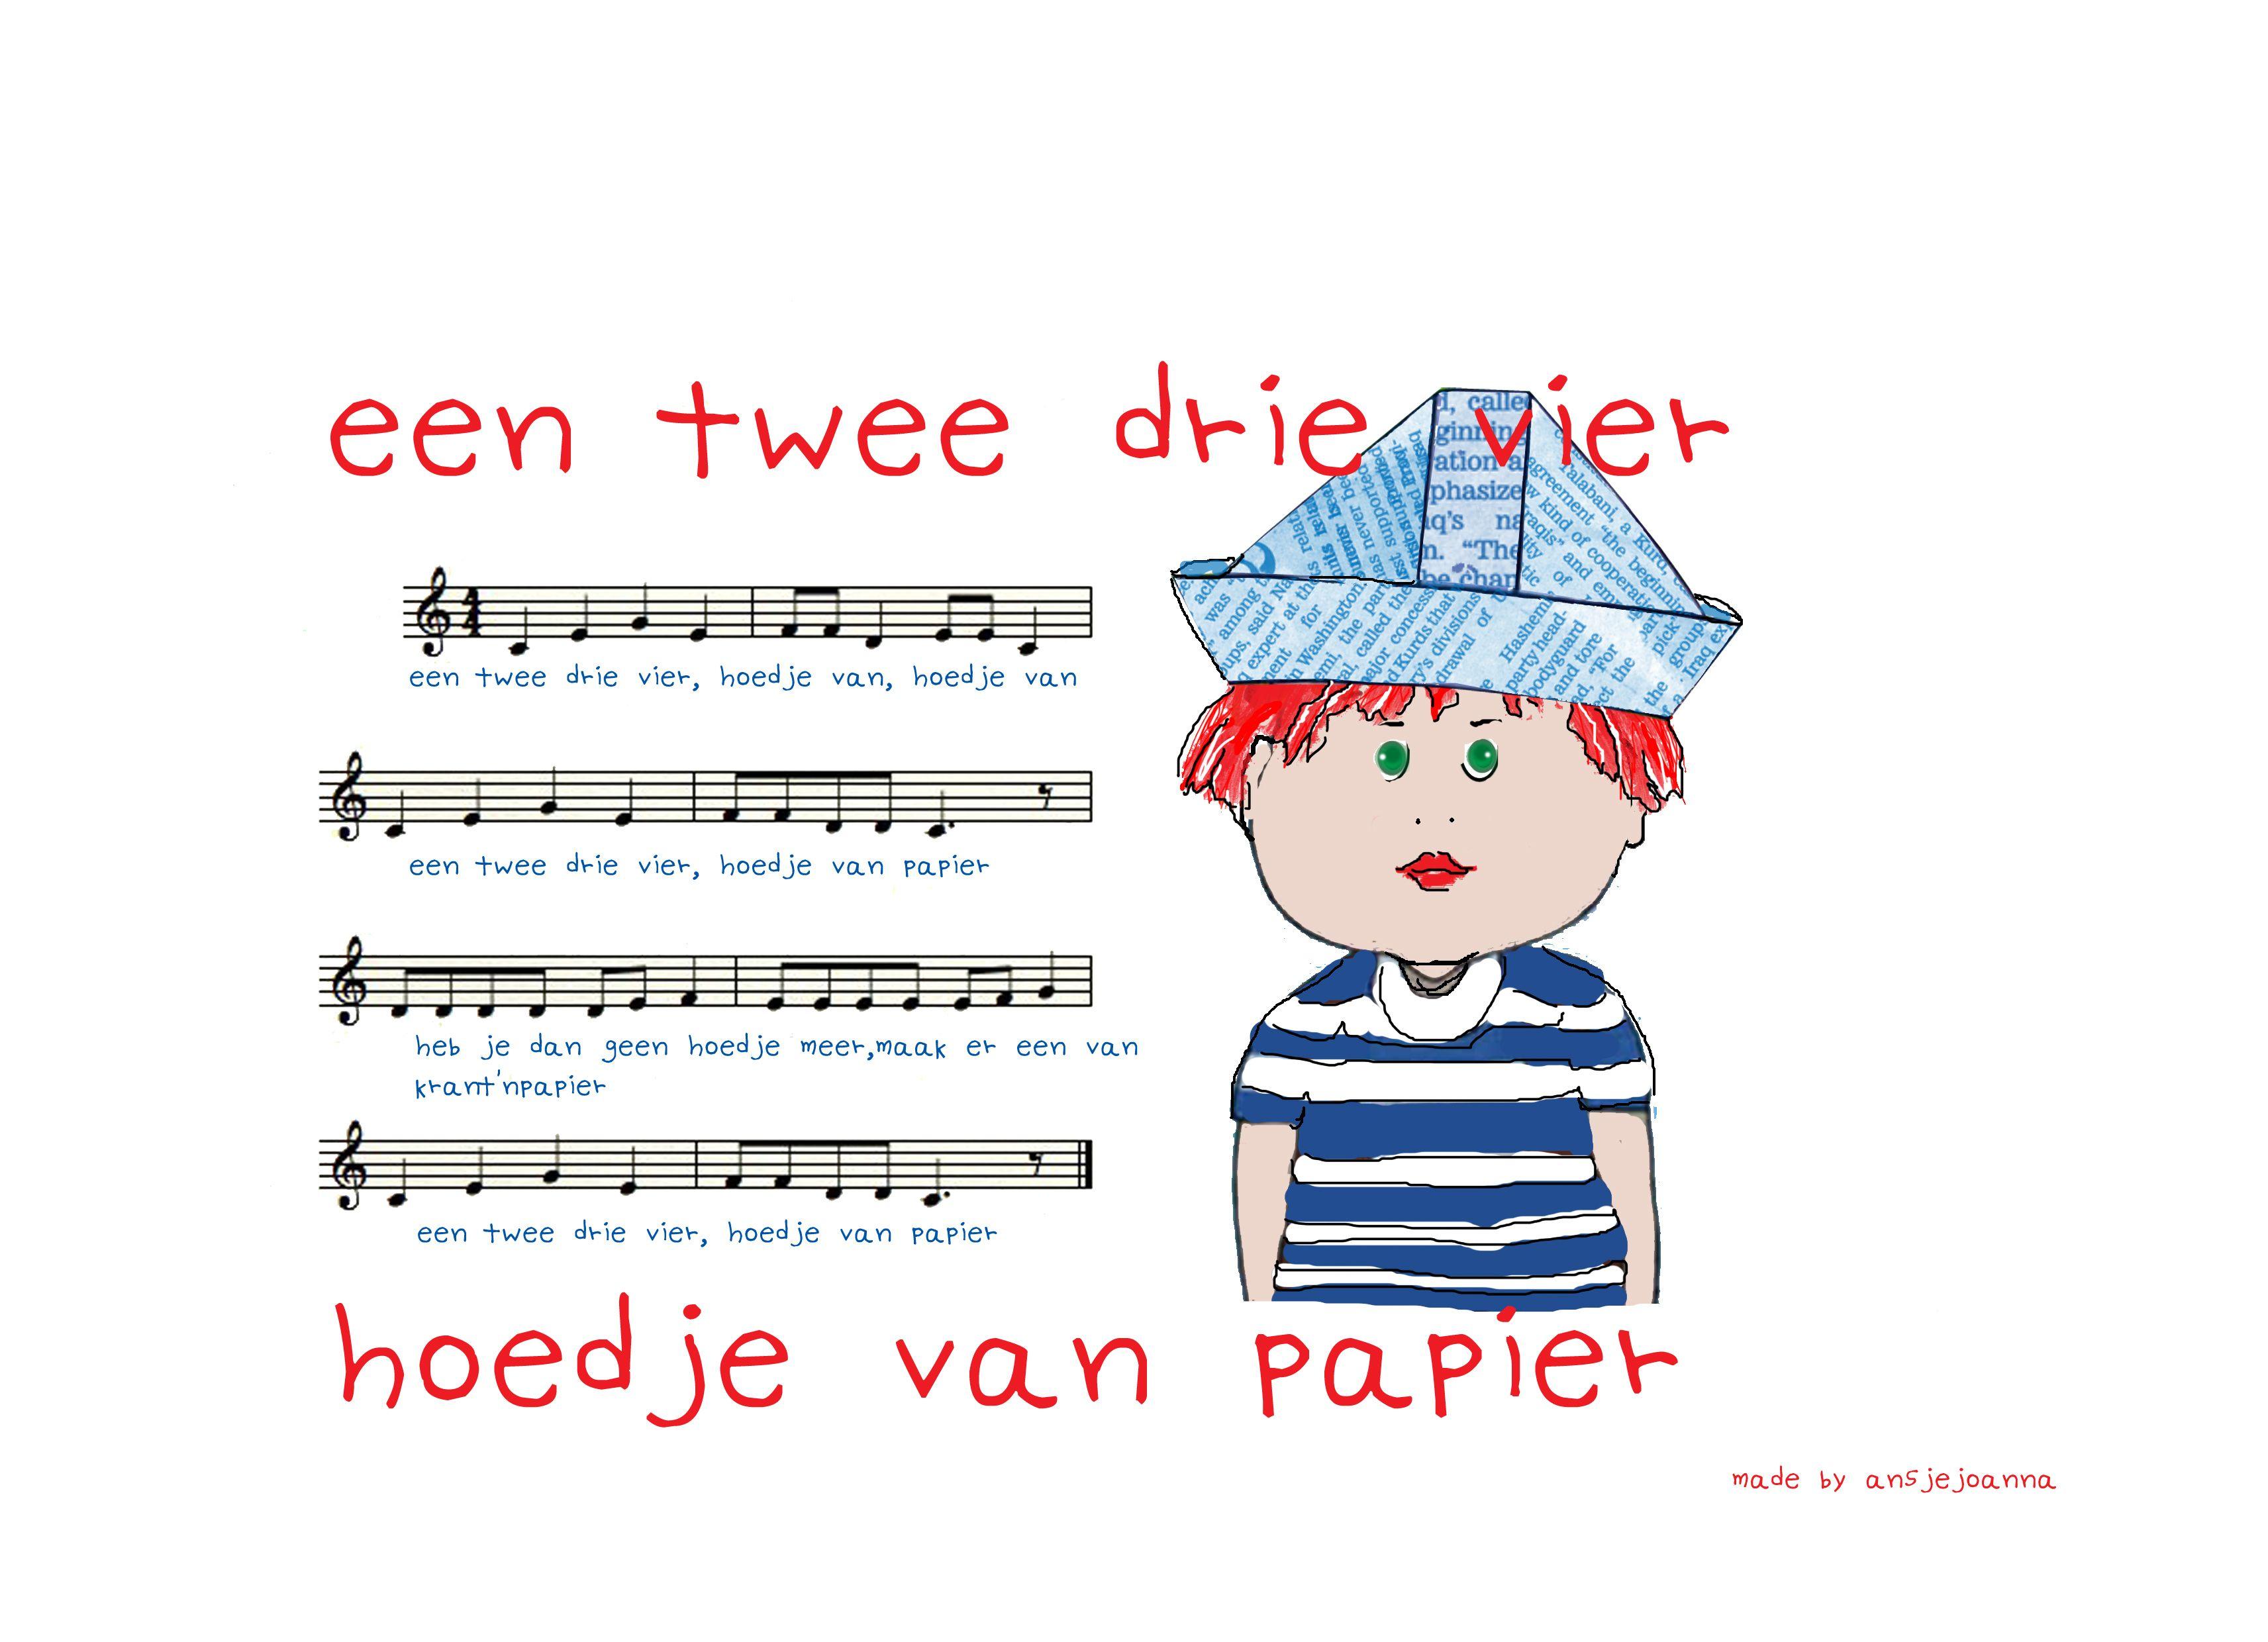 hoedje papier thema kinderliedjes hoeden